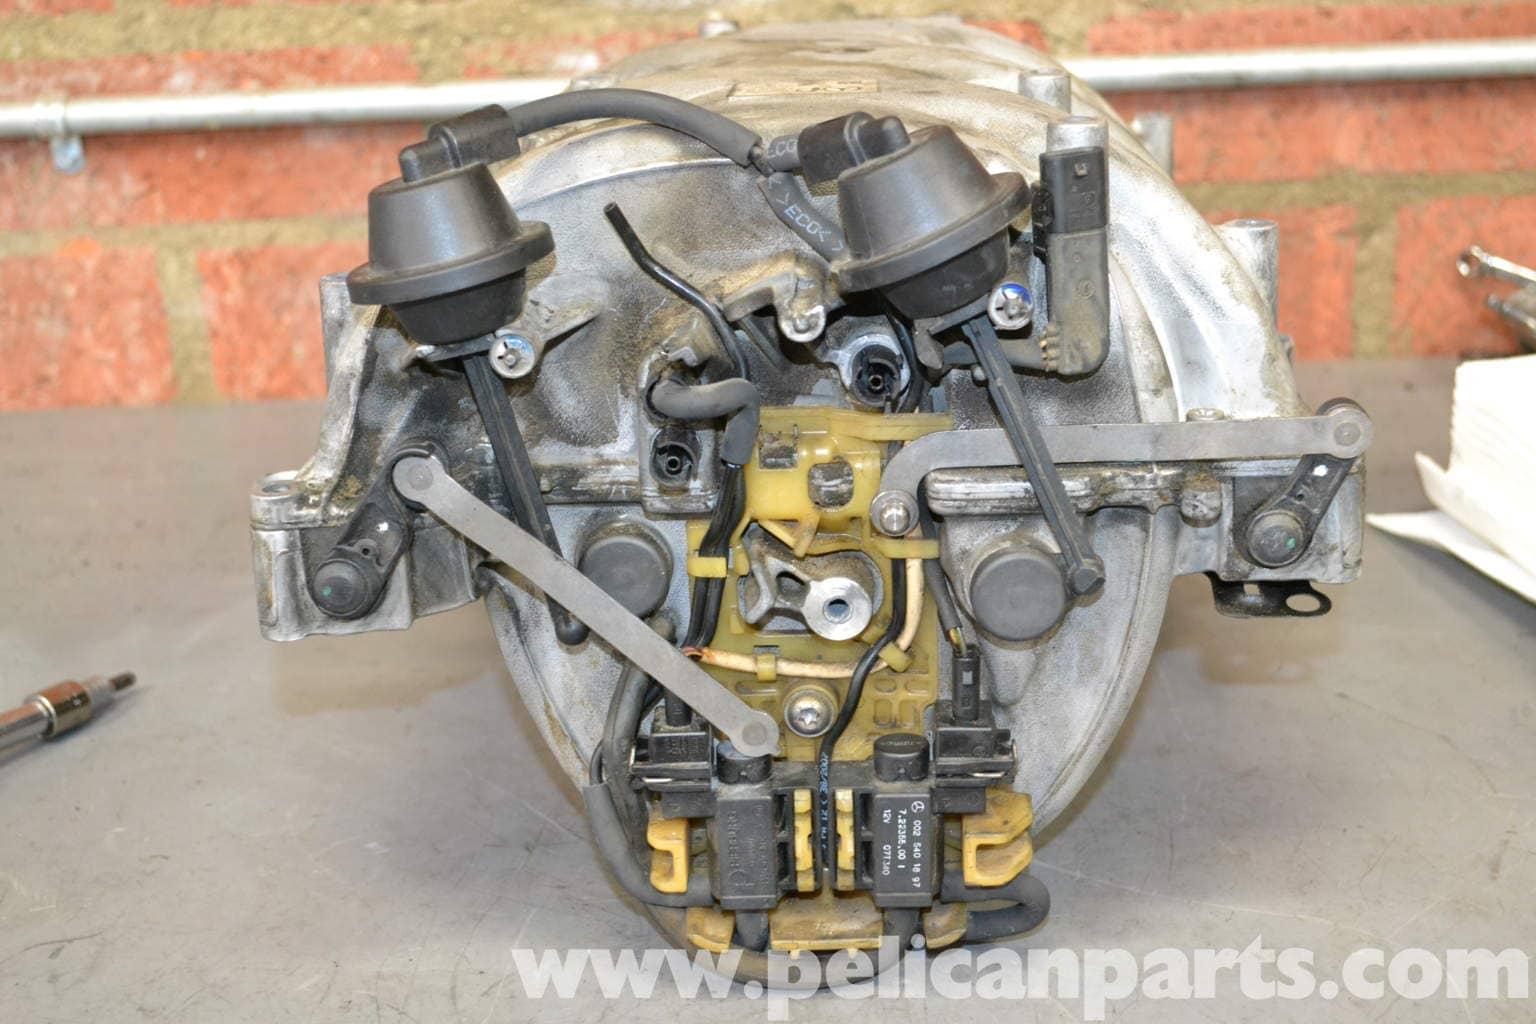 Mercedes benz w204 tumble flap actuator repair 2008 for Mercedes benz c300 engine